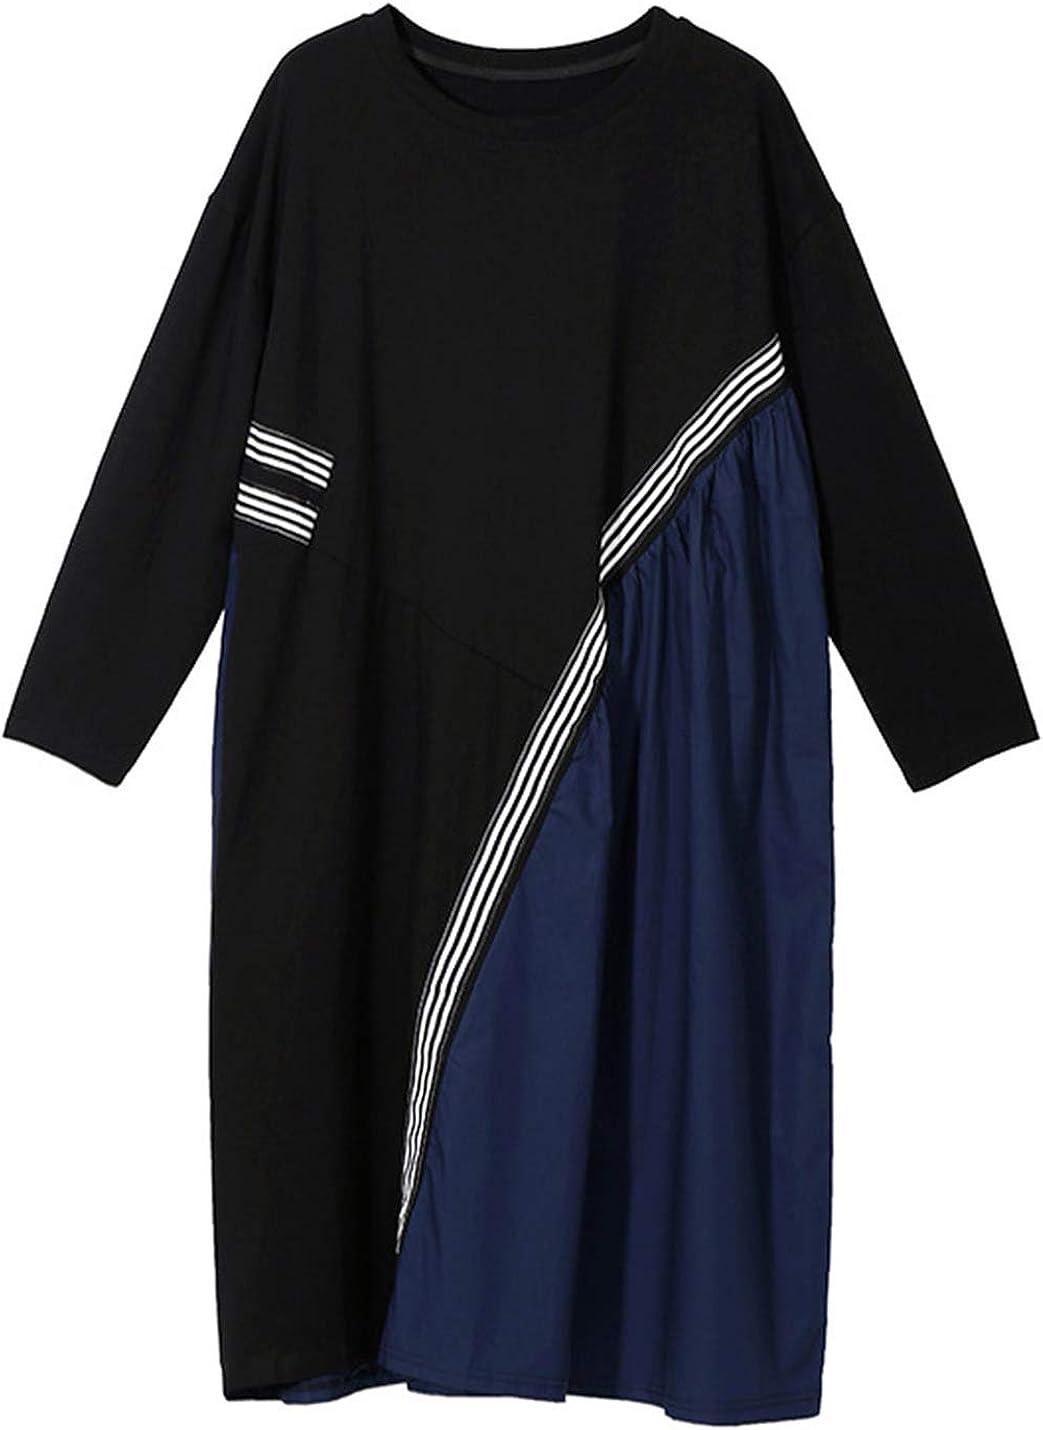 Omoone Women's Oversize Patchwork Mid Long Asymmetrical Tunic Dress Tops